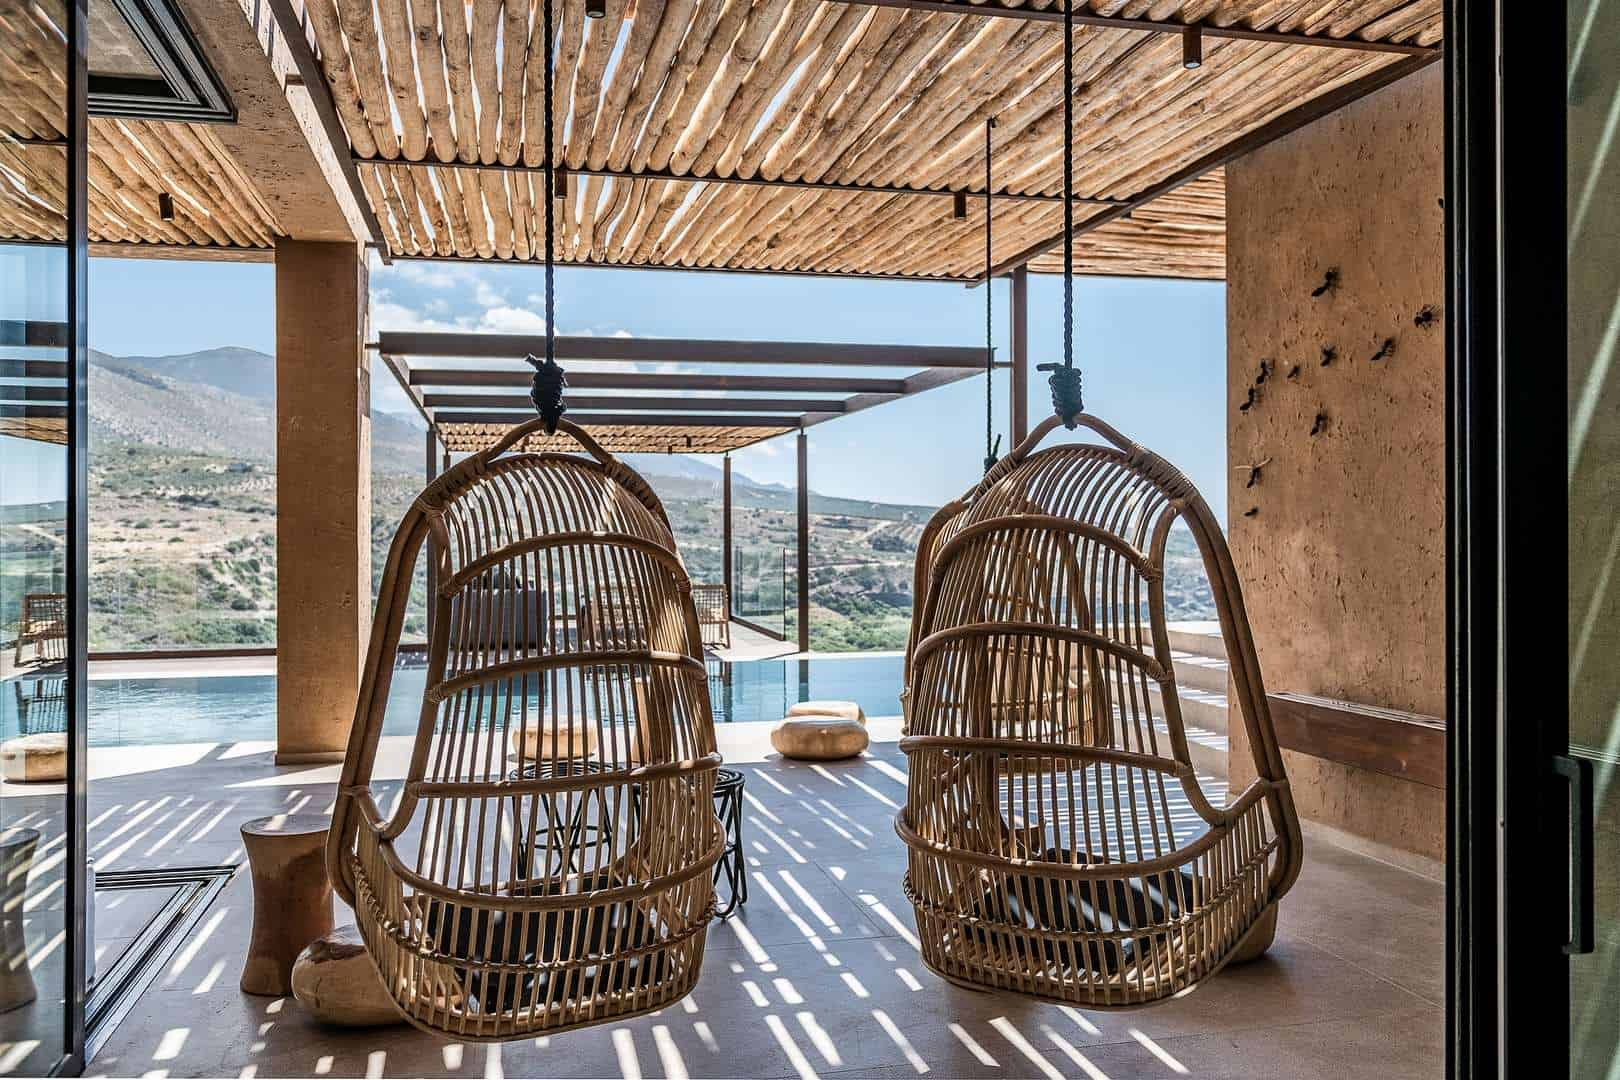 Swings, a piece of art - villa San Matteo